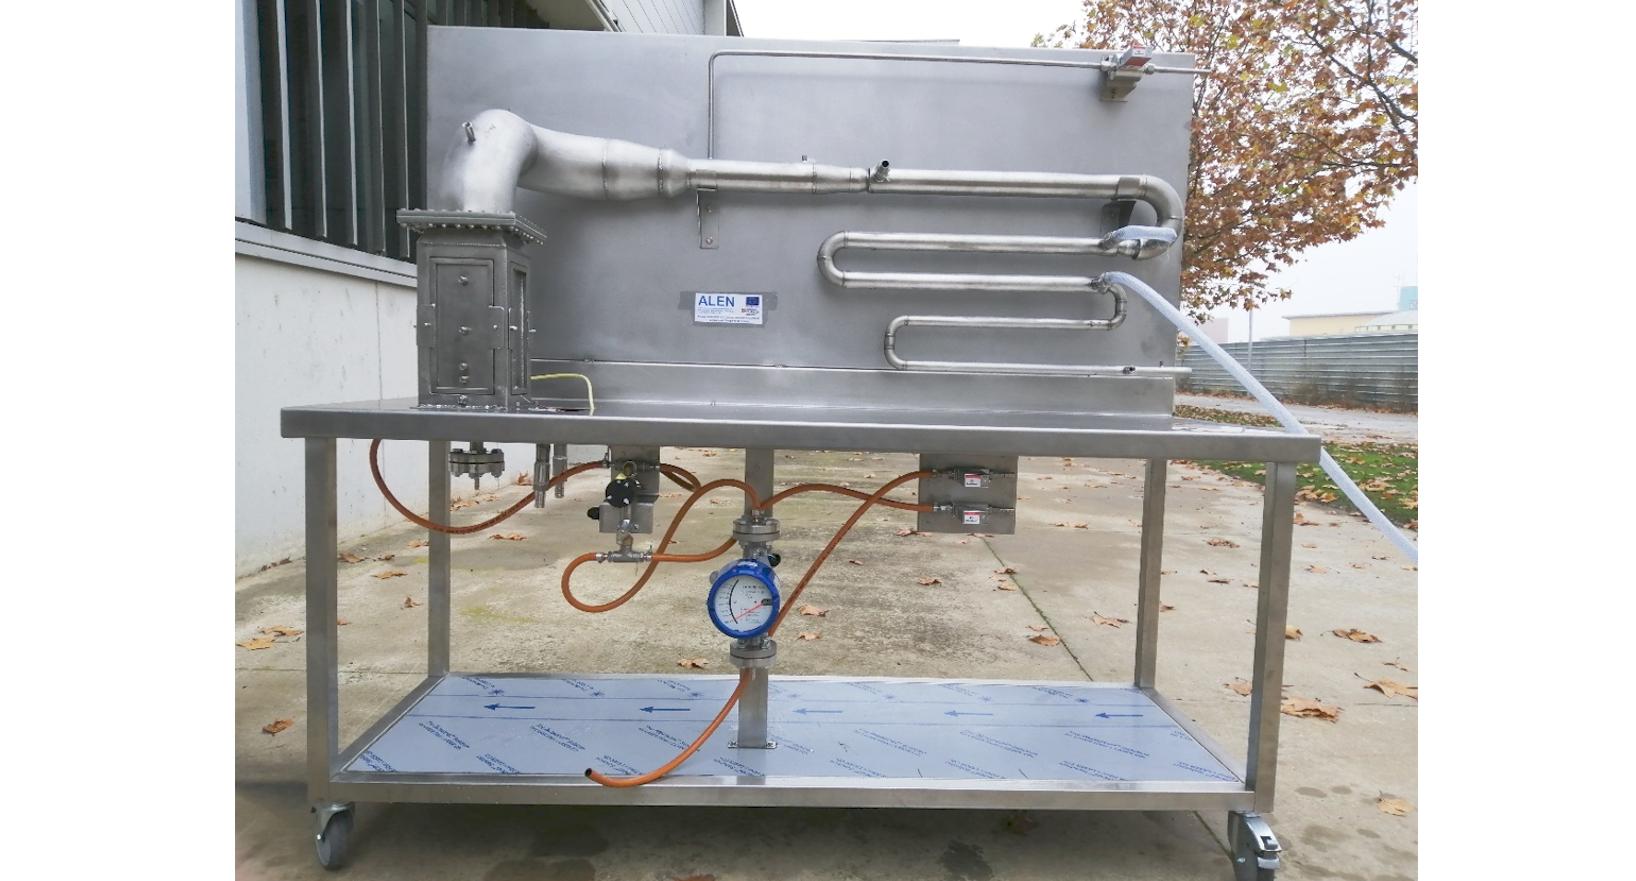 Oxy-fuel burner experimental plant